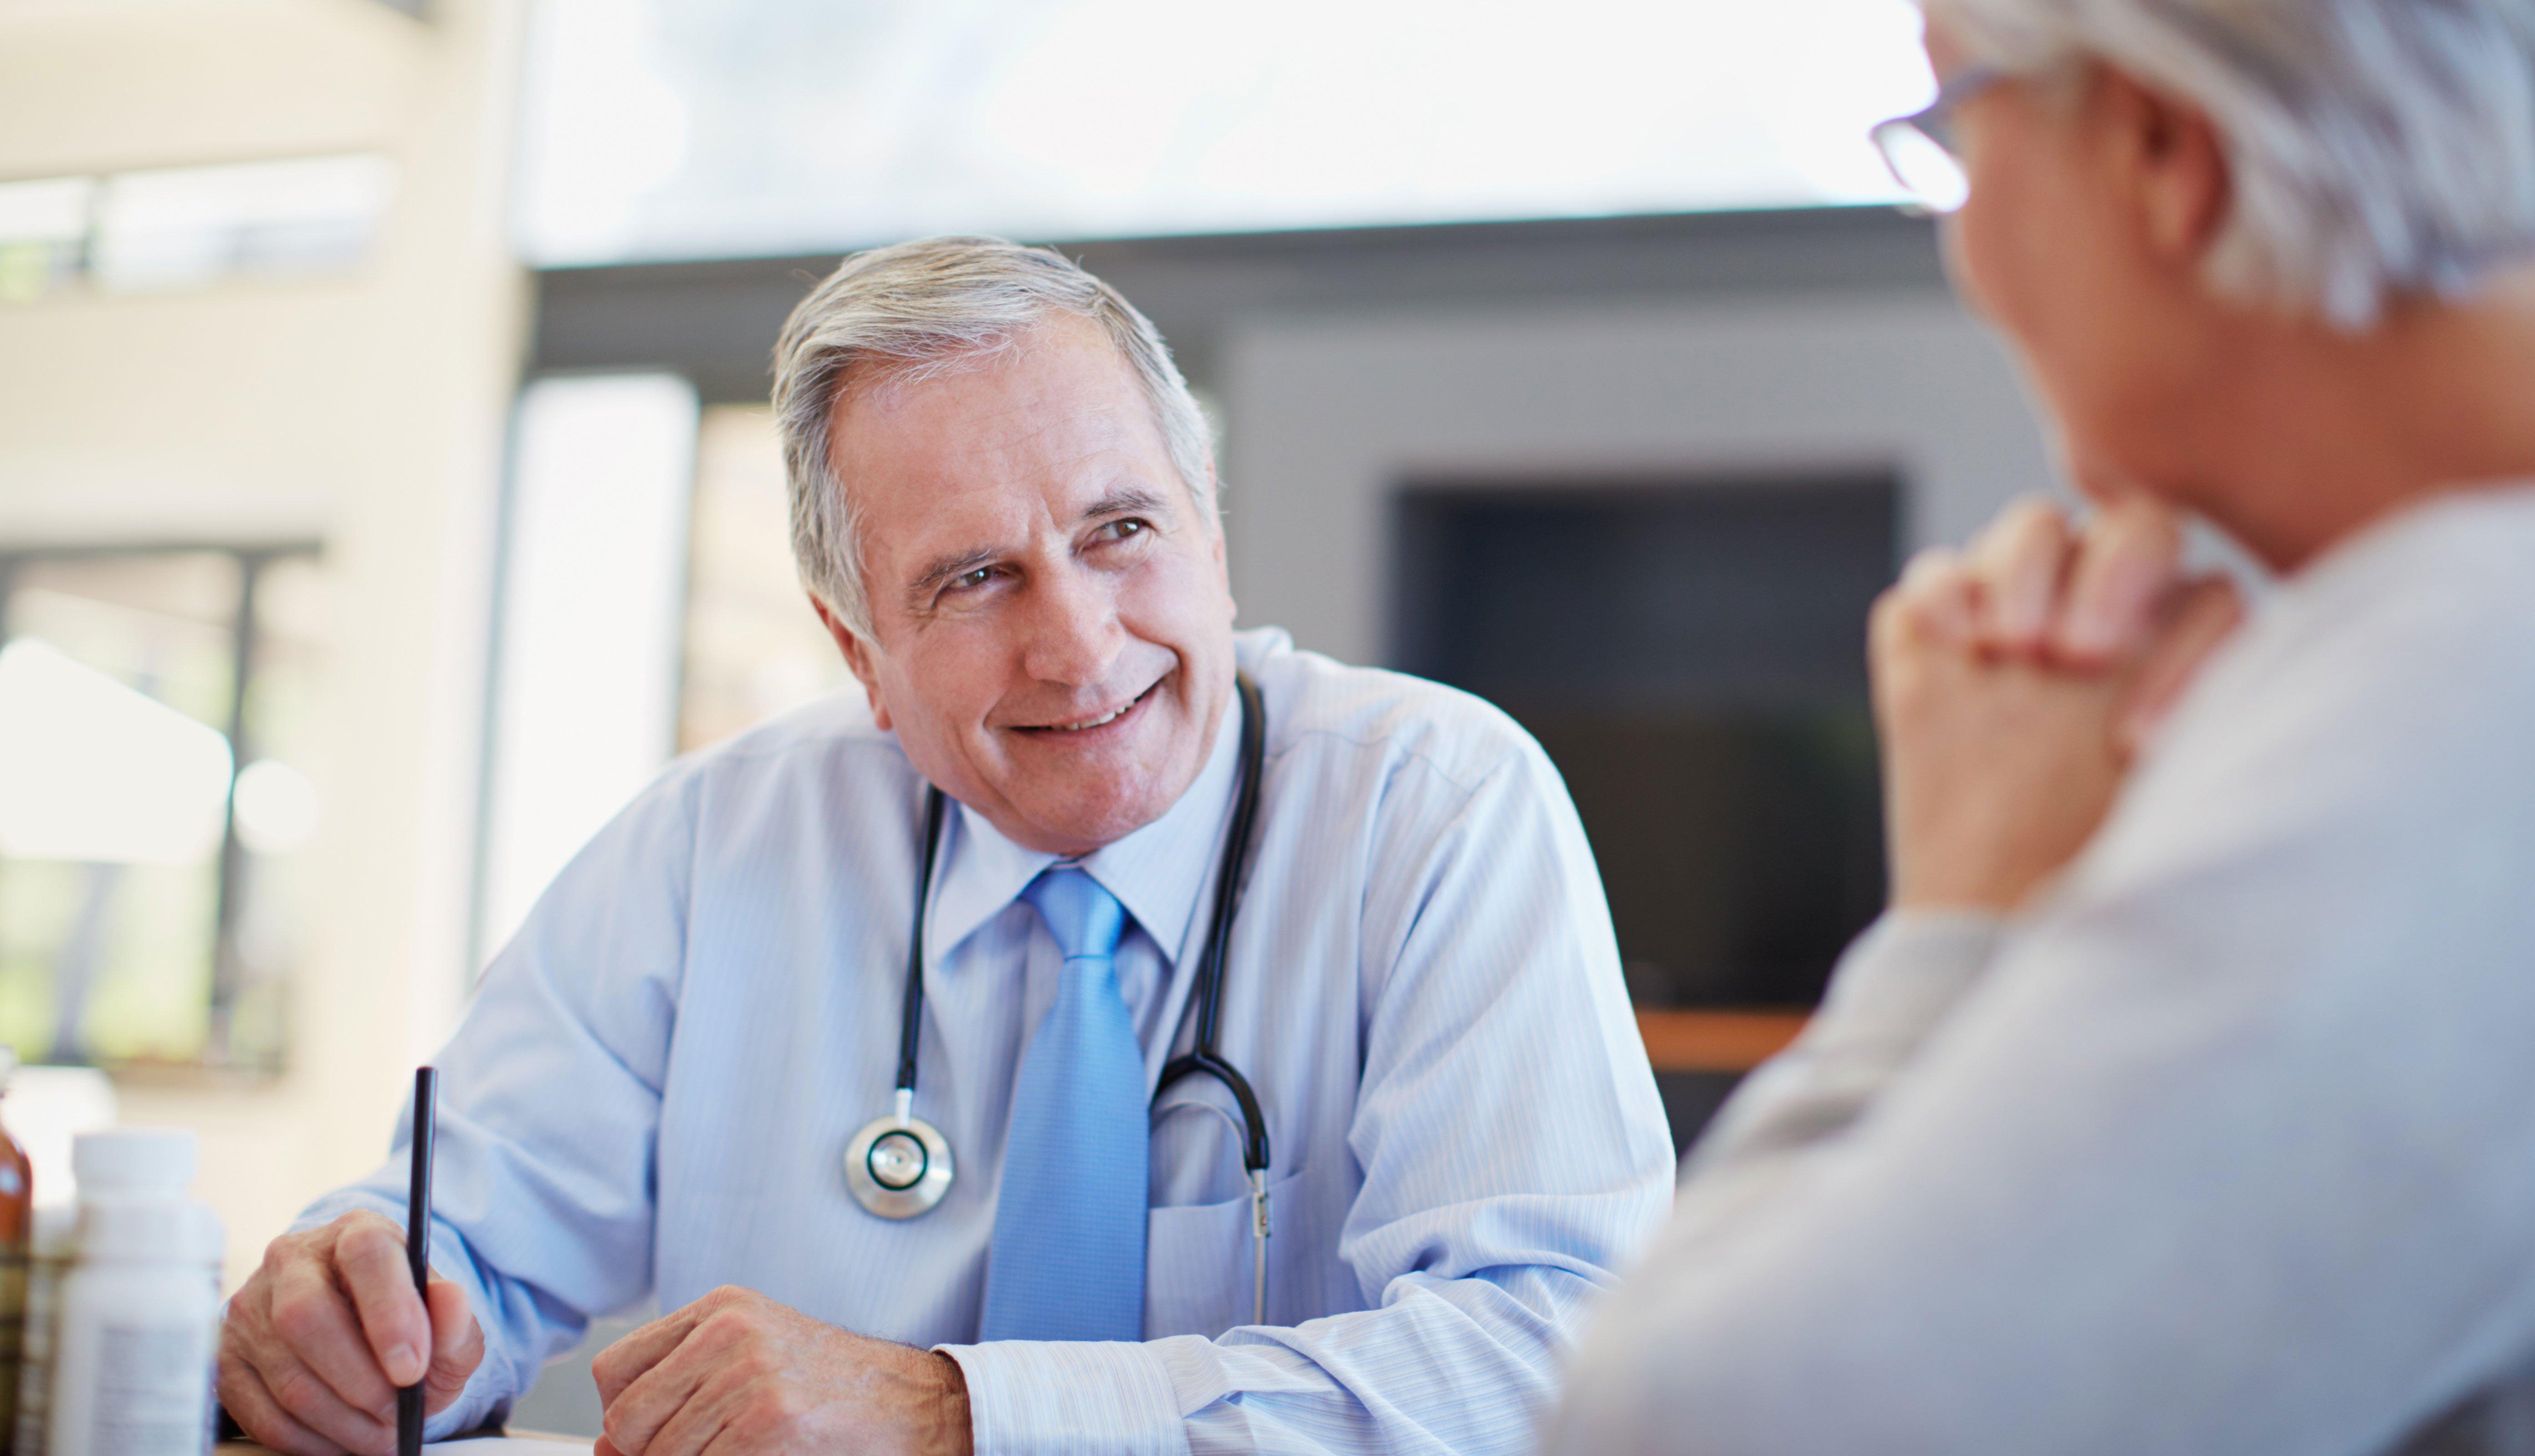 Consulta médico paciente